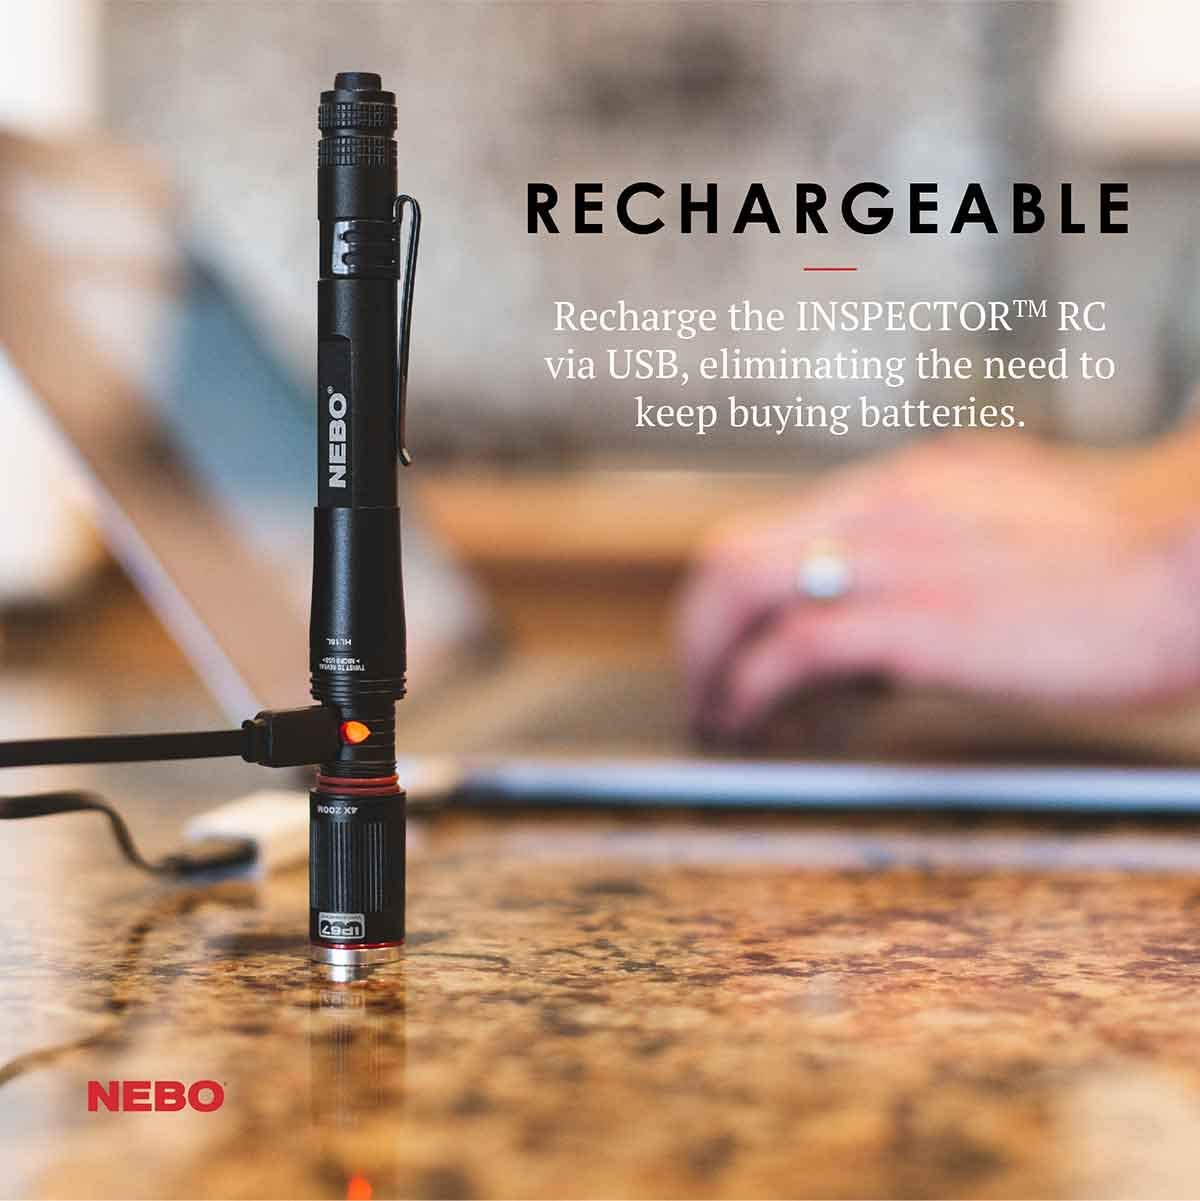 Nebo Inspector RC penlight flashlight 360 Lumen Rechargeable /& Waterproof EDC pocket Bundle with EdisonBright USB Wall Adapter